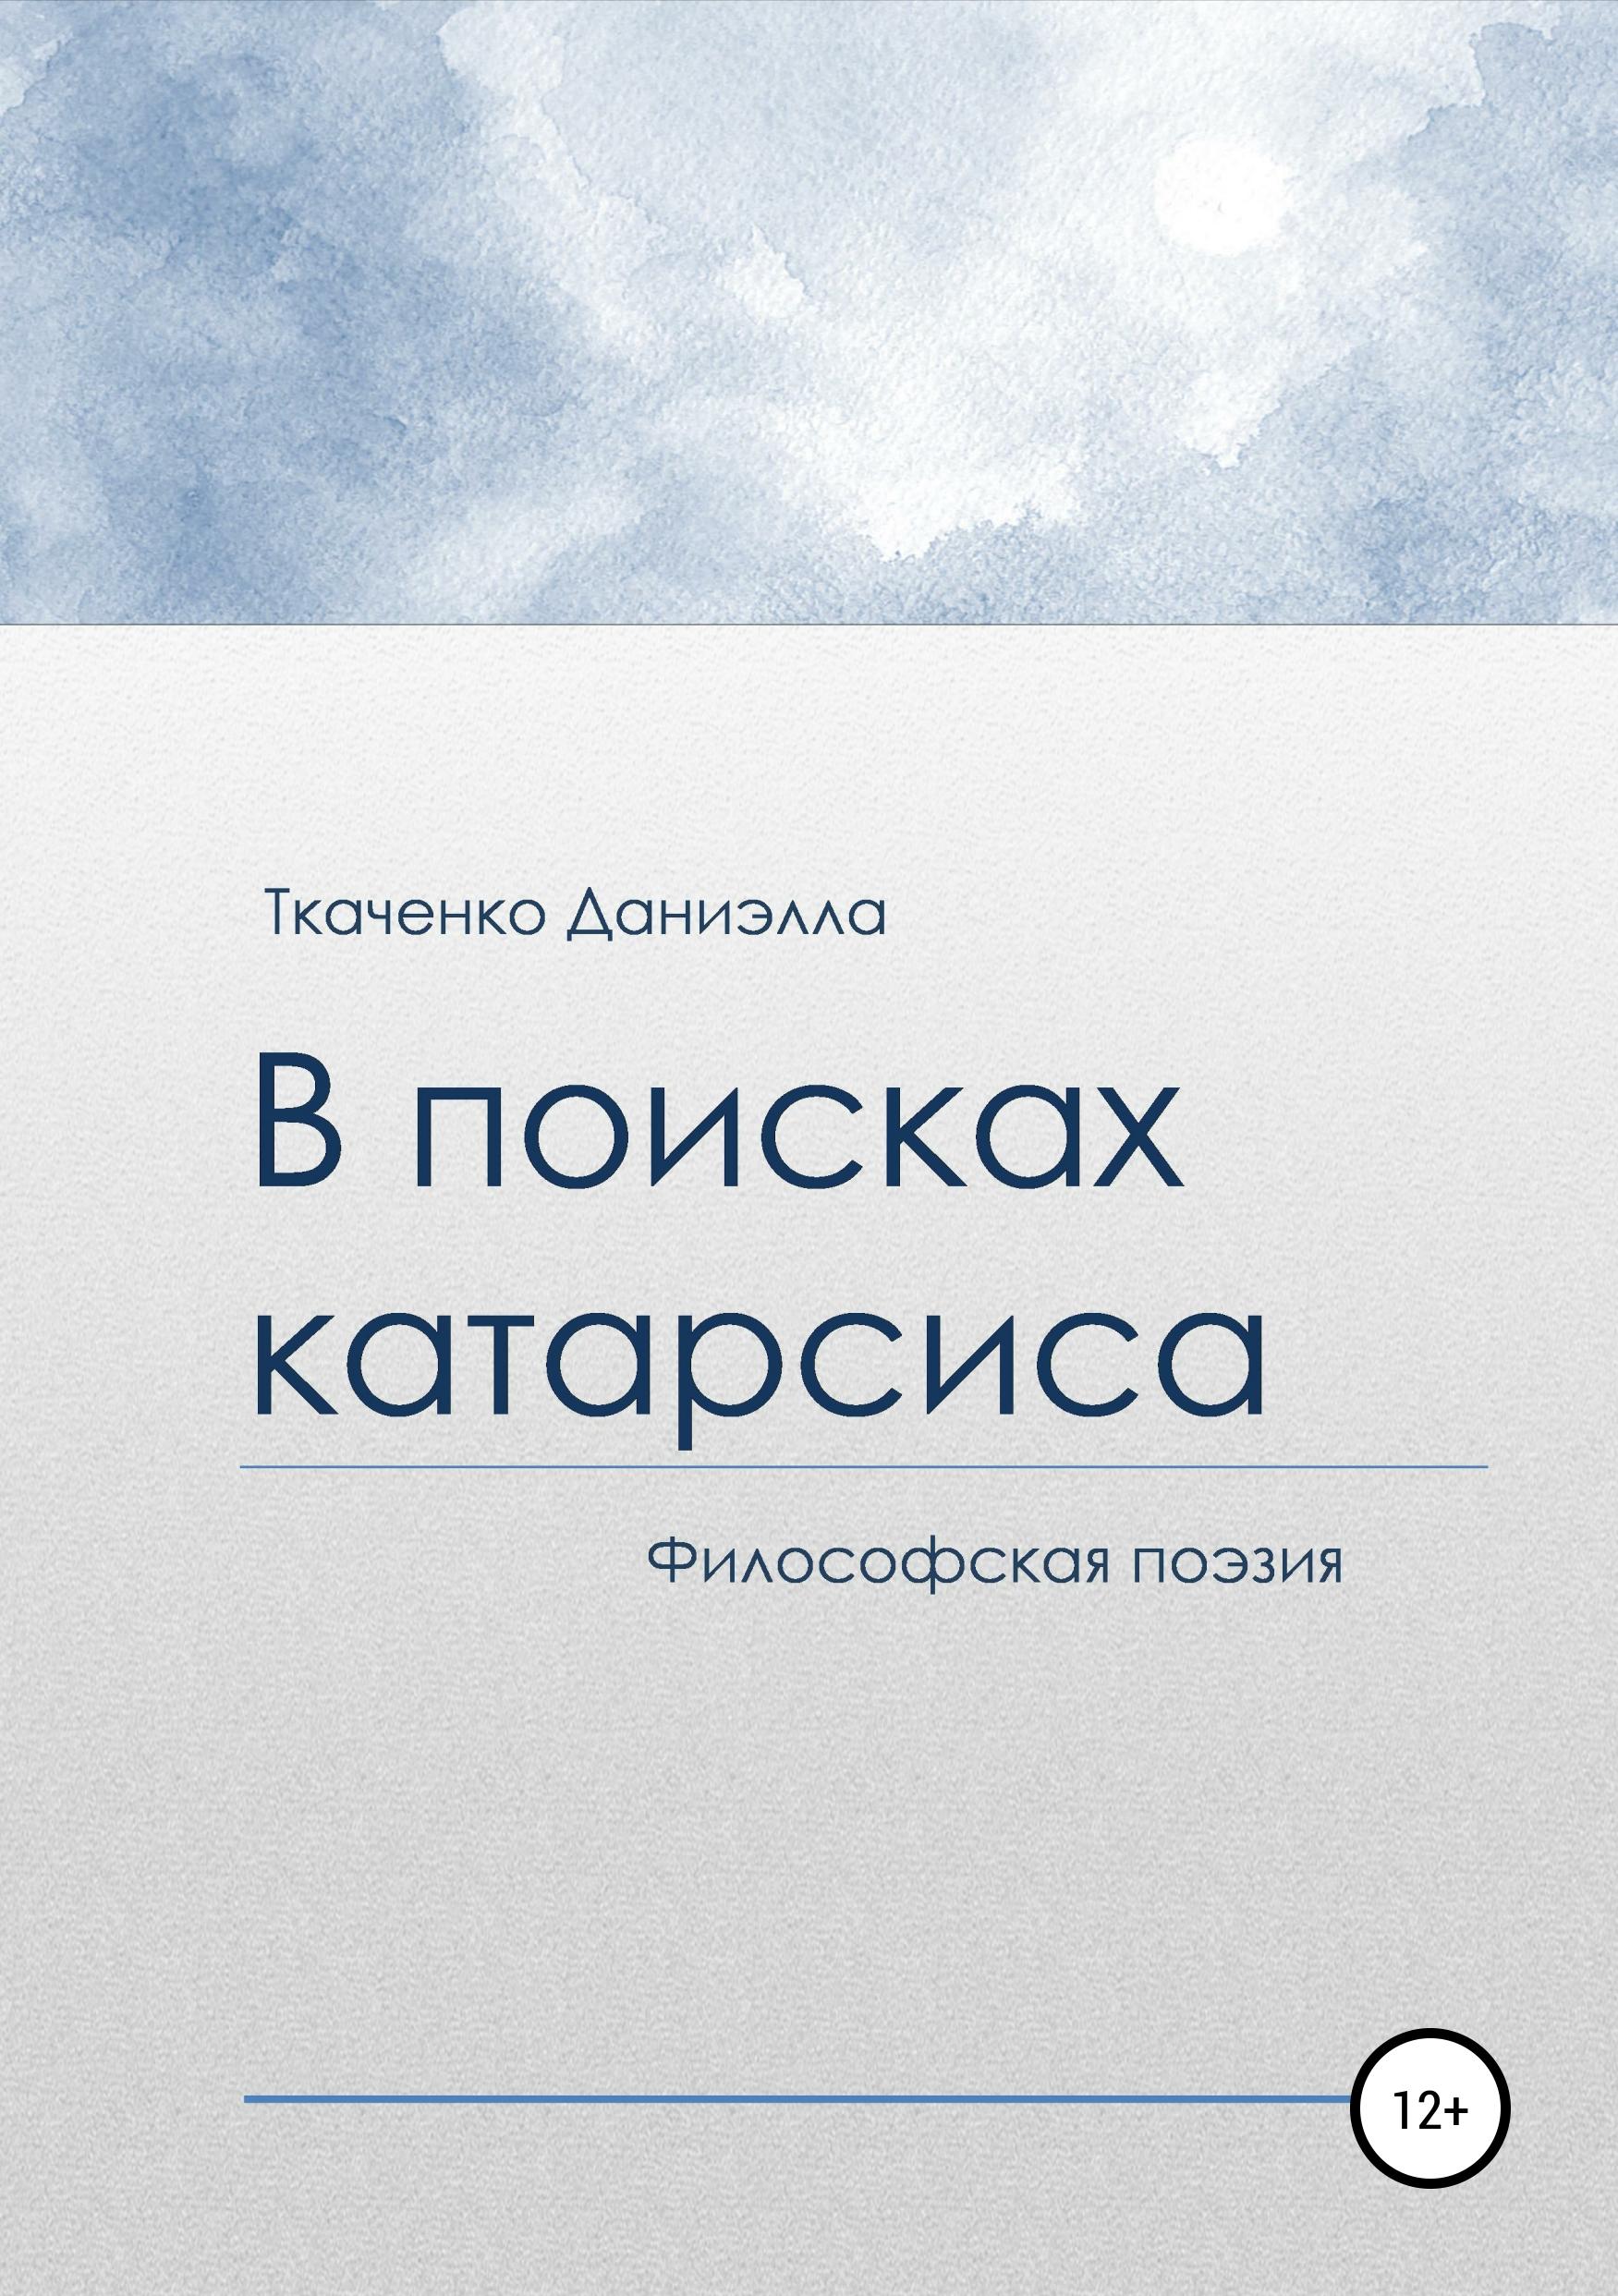 Даниэлла Александровна Ткаченко В поисках катарсиса анна александровна кривицкая баку – москва впоисках дома